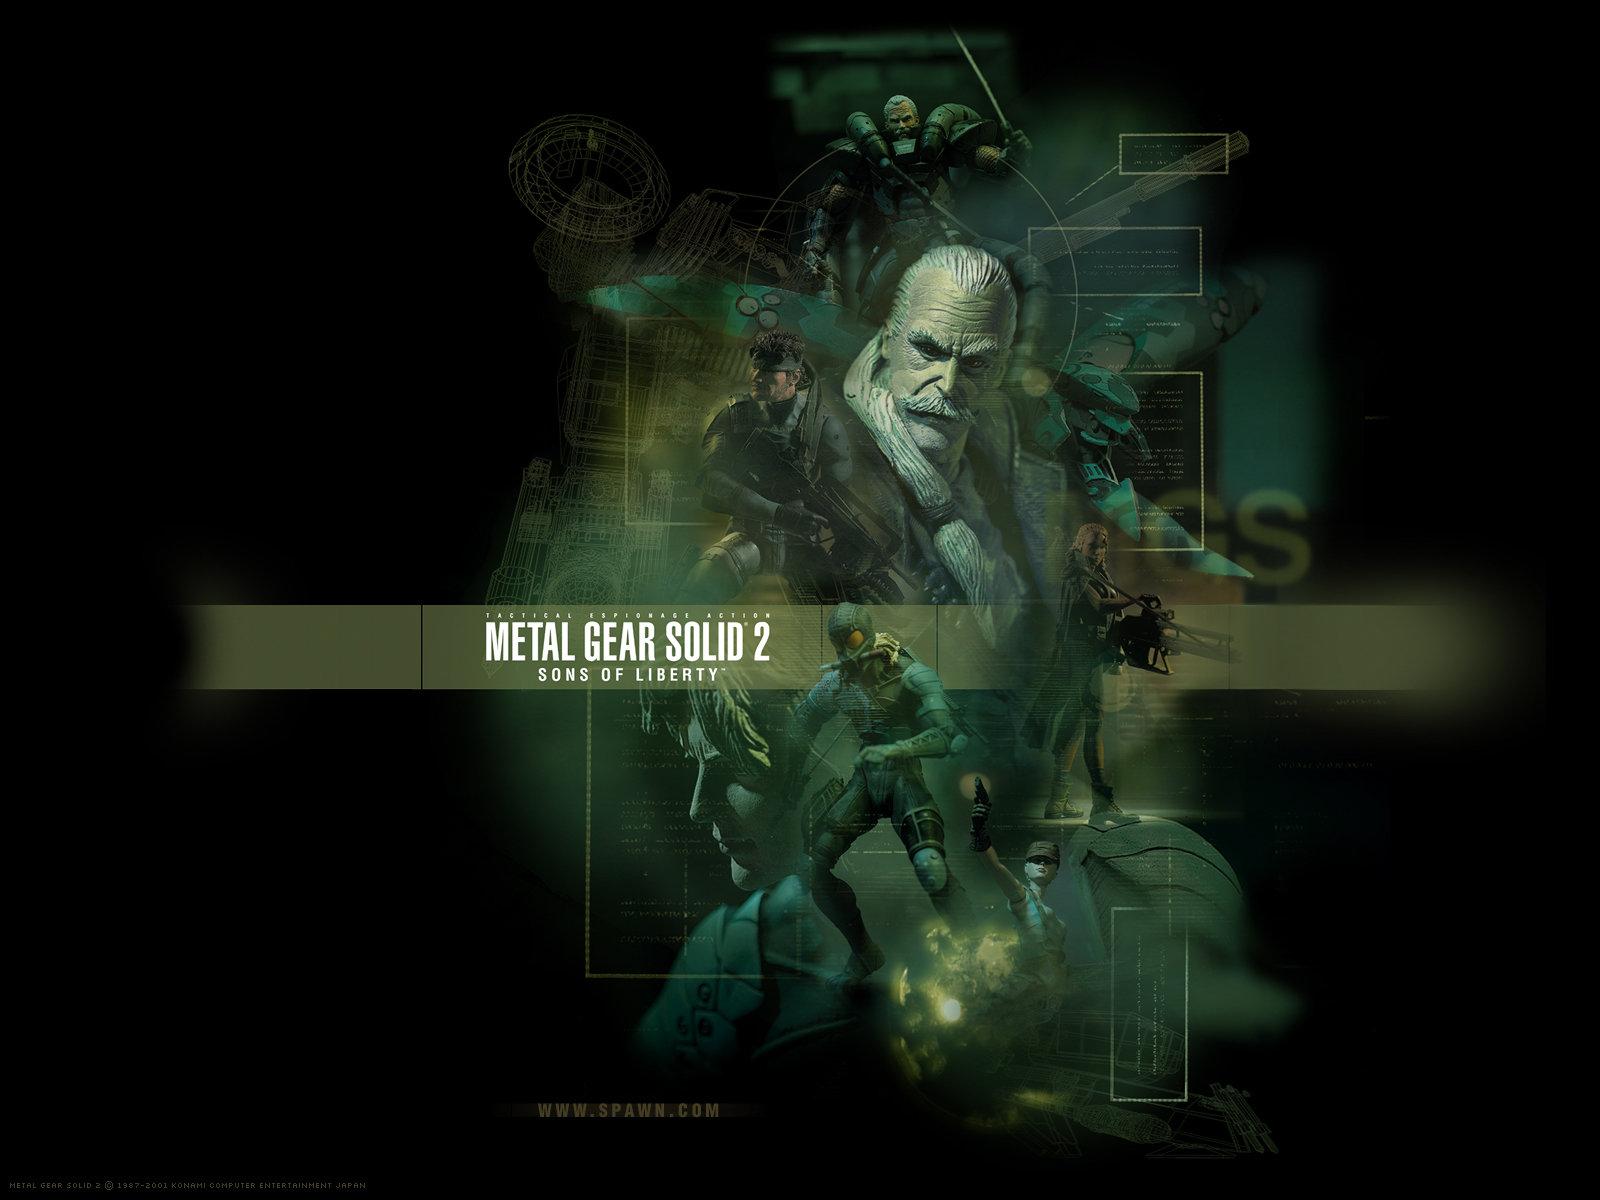 Metal Gear Solid 2 Wallpaper: Metal Gear Solid (MGS) Wallpapers HD For Desktop Backgrounds